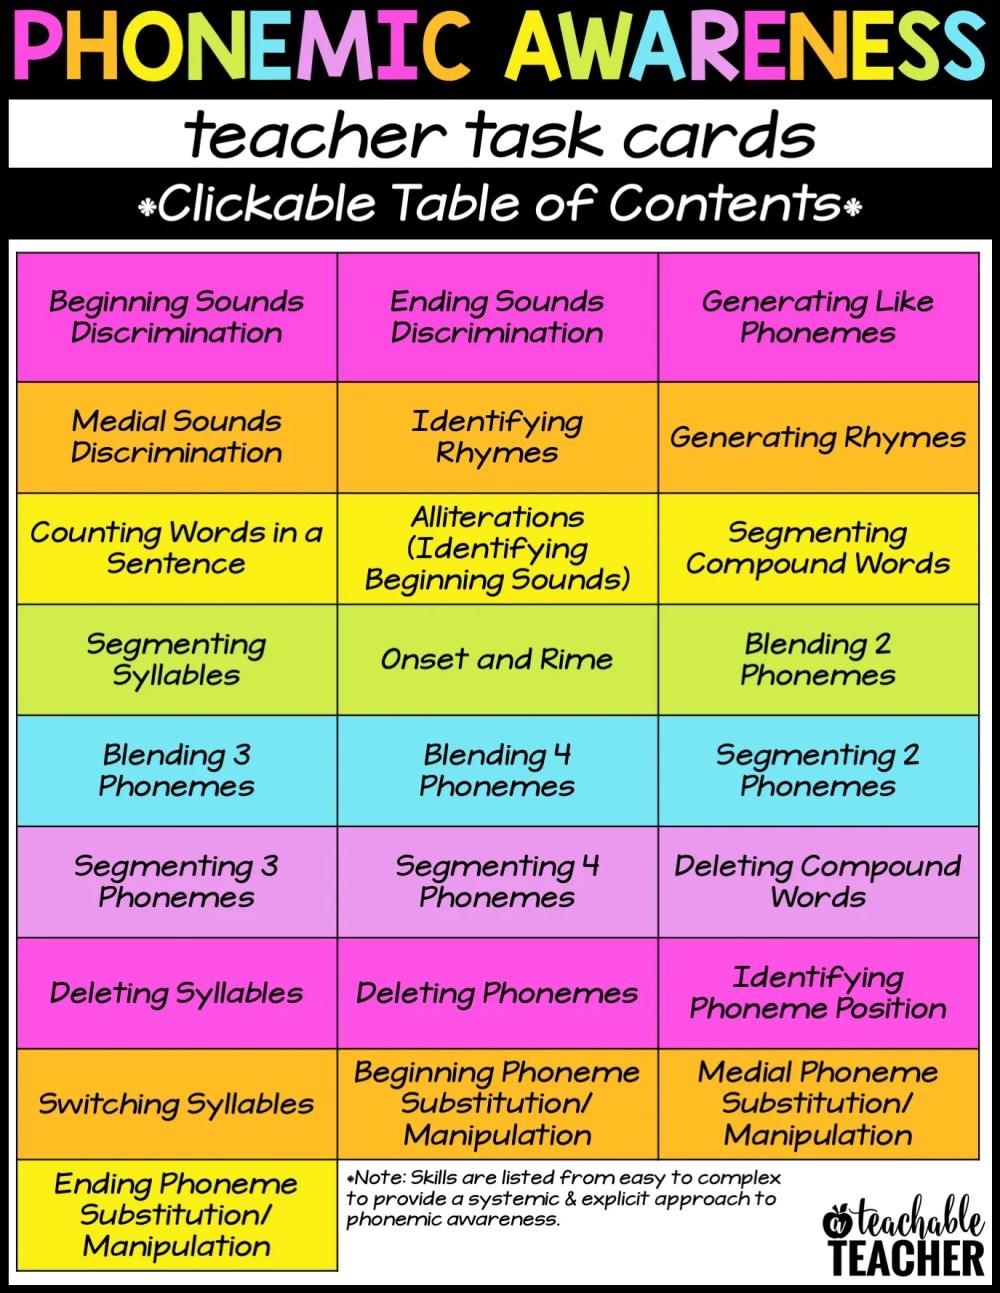 medium resolution of Phonemic Awareness Teacher Task Cards - A Teachable Teacher